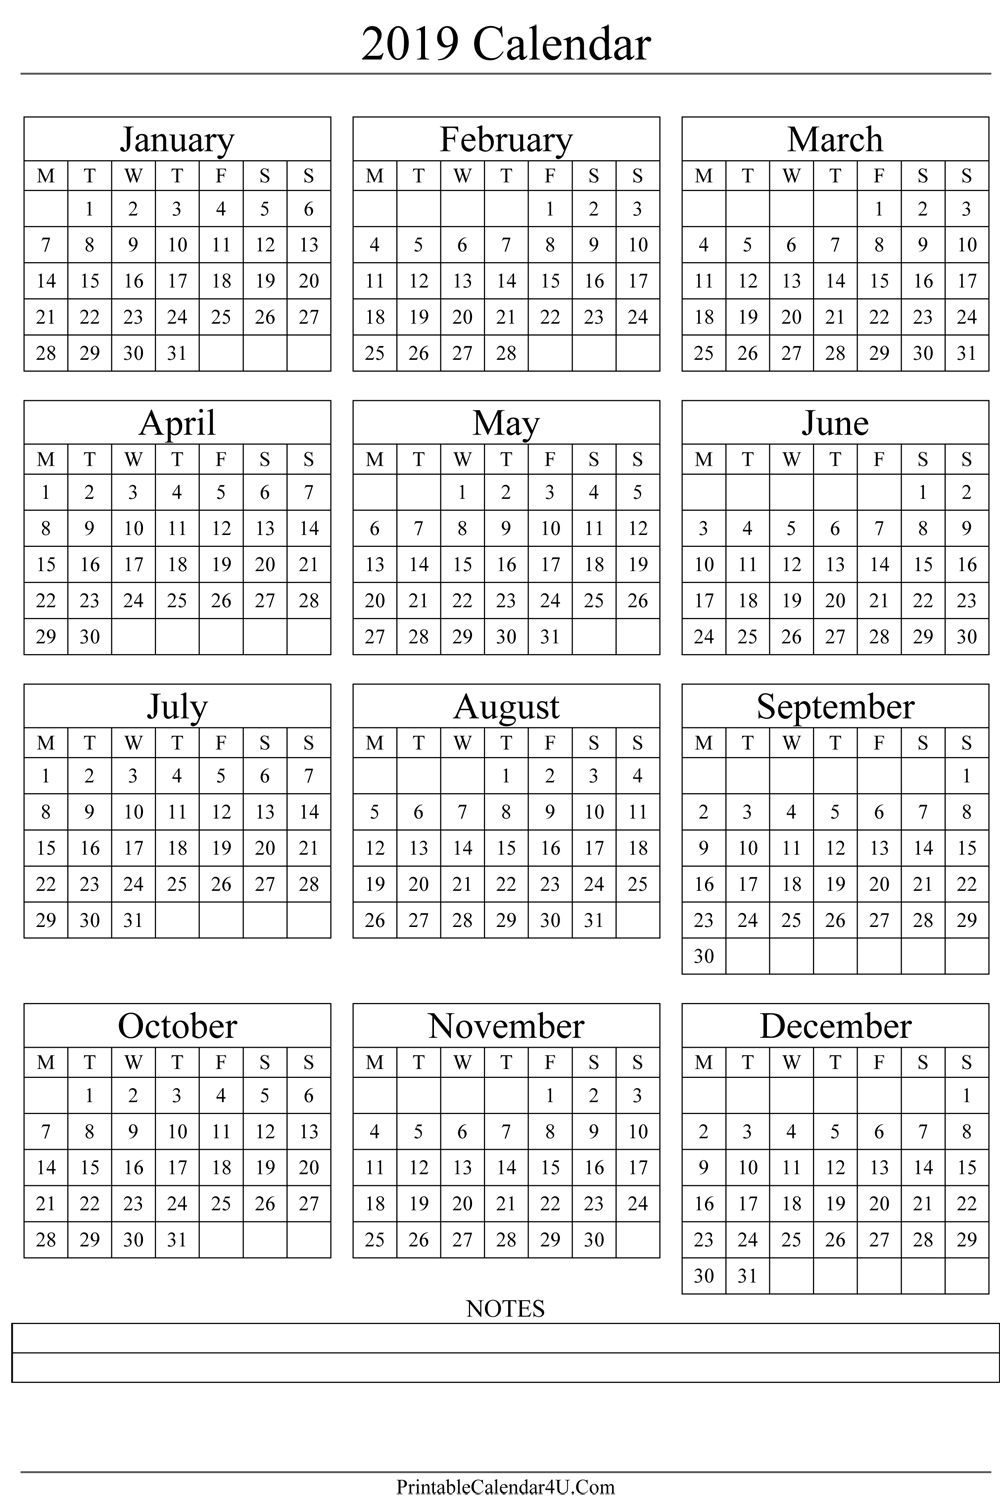 Annual Calendar 2019 Portrait Printable Calendar 2017 2018 2019 pertaining to 5X 7 Printable 2019-2020